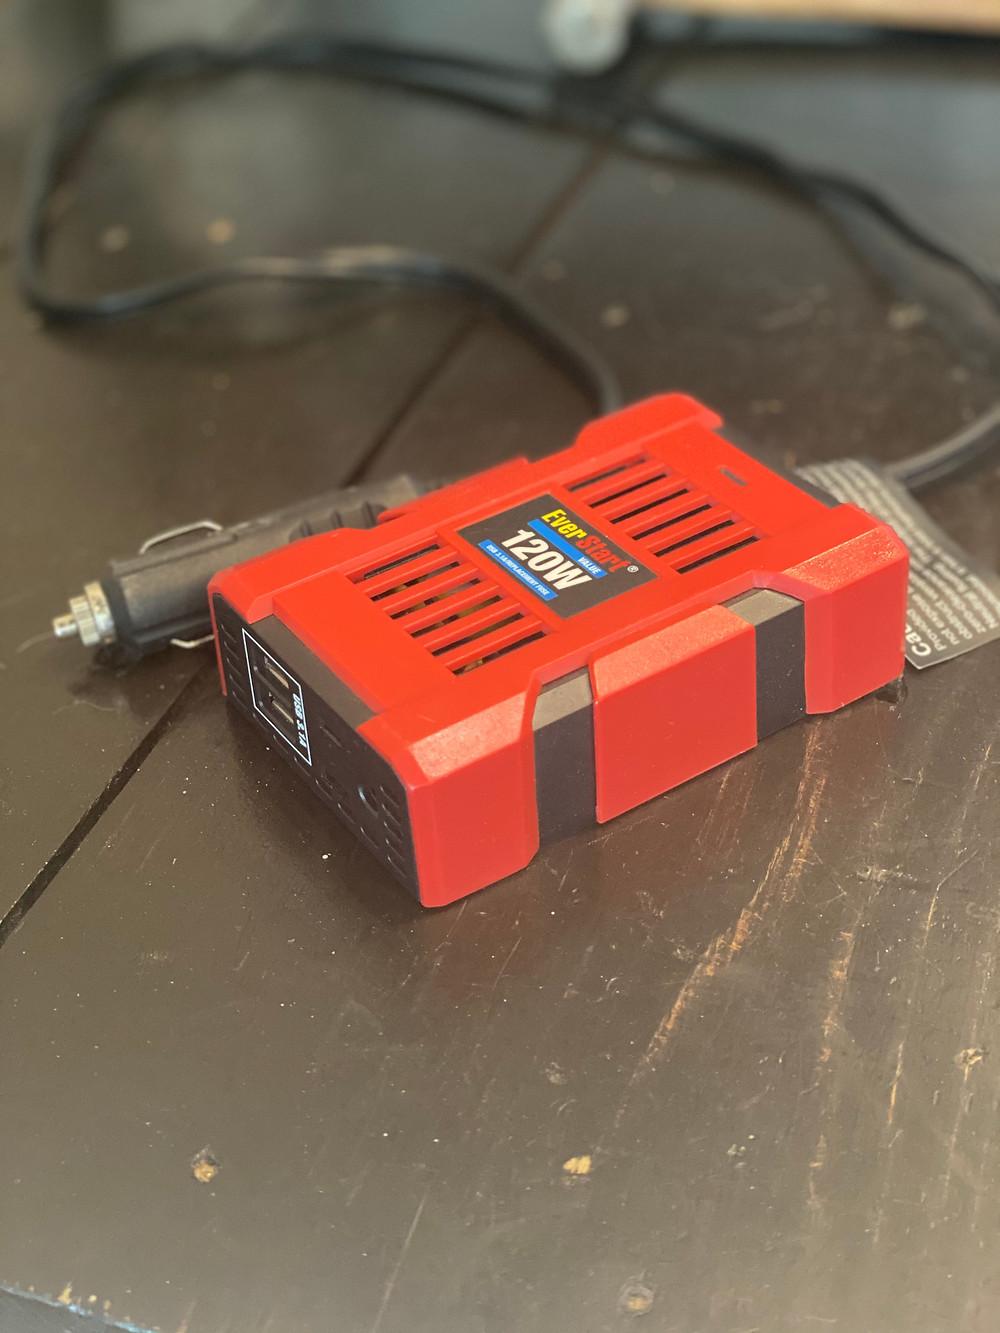 120W mini inverter 12V car charger